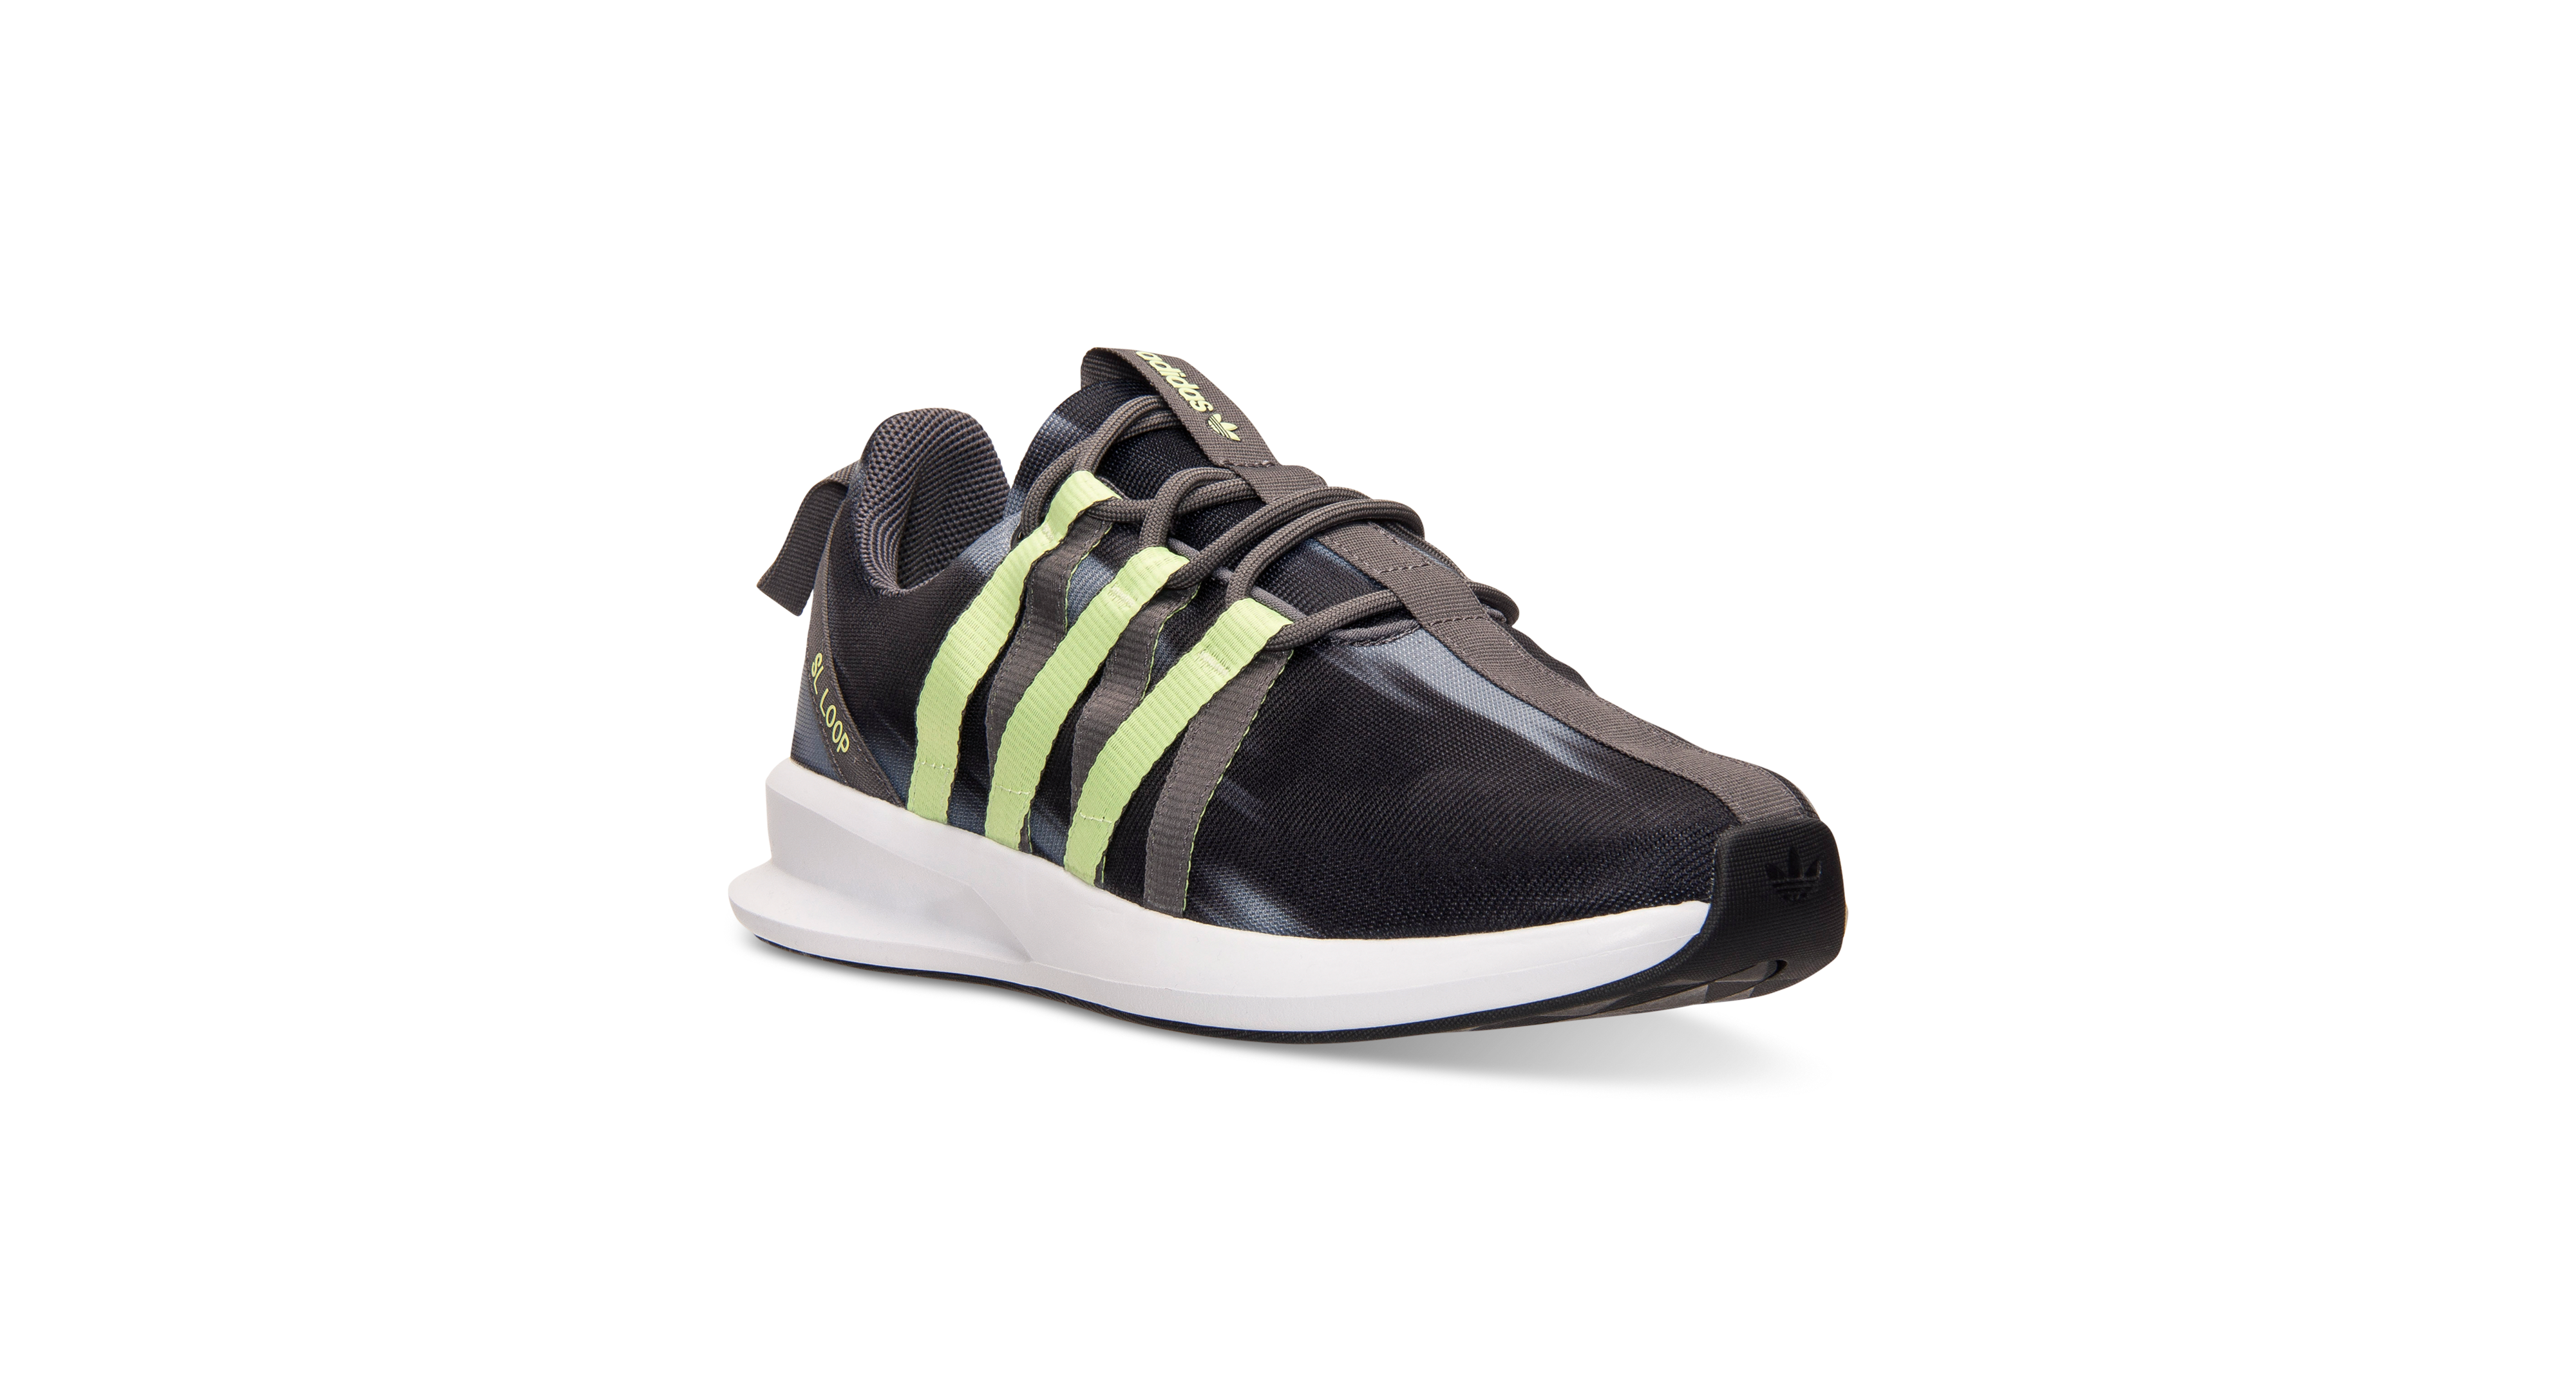 0c974e0d1fa34b adidas Men s Originals Sl Loop Racer Cloud Print Casual Sneakers from  Finish Line